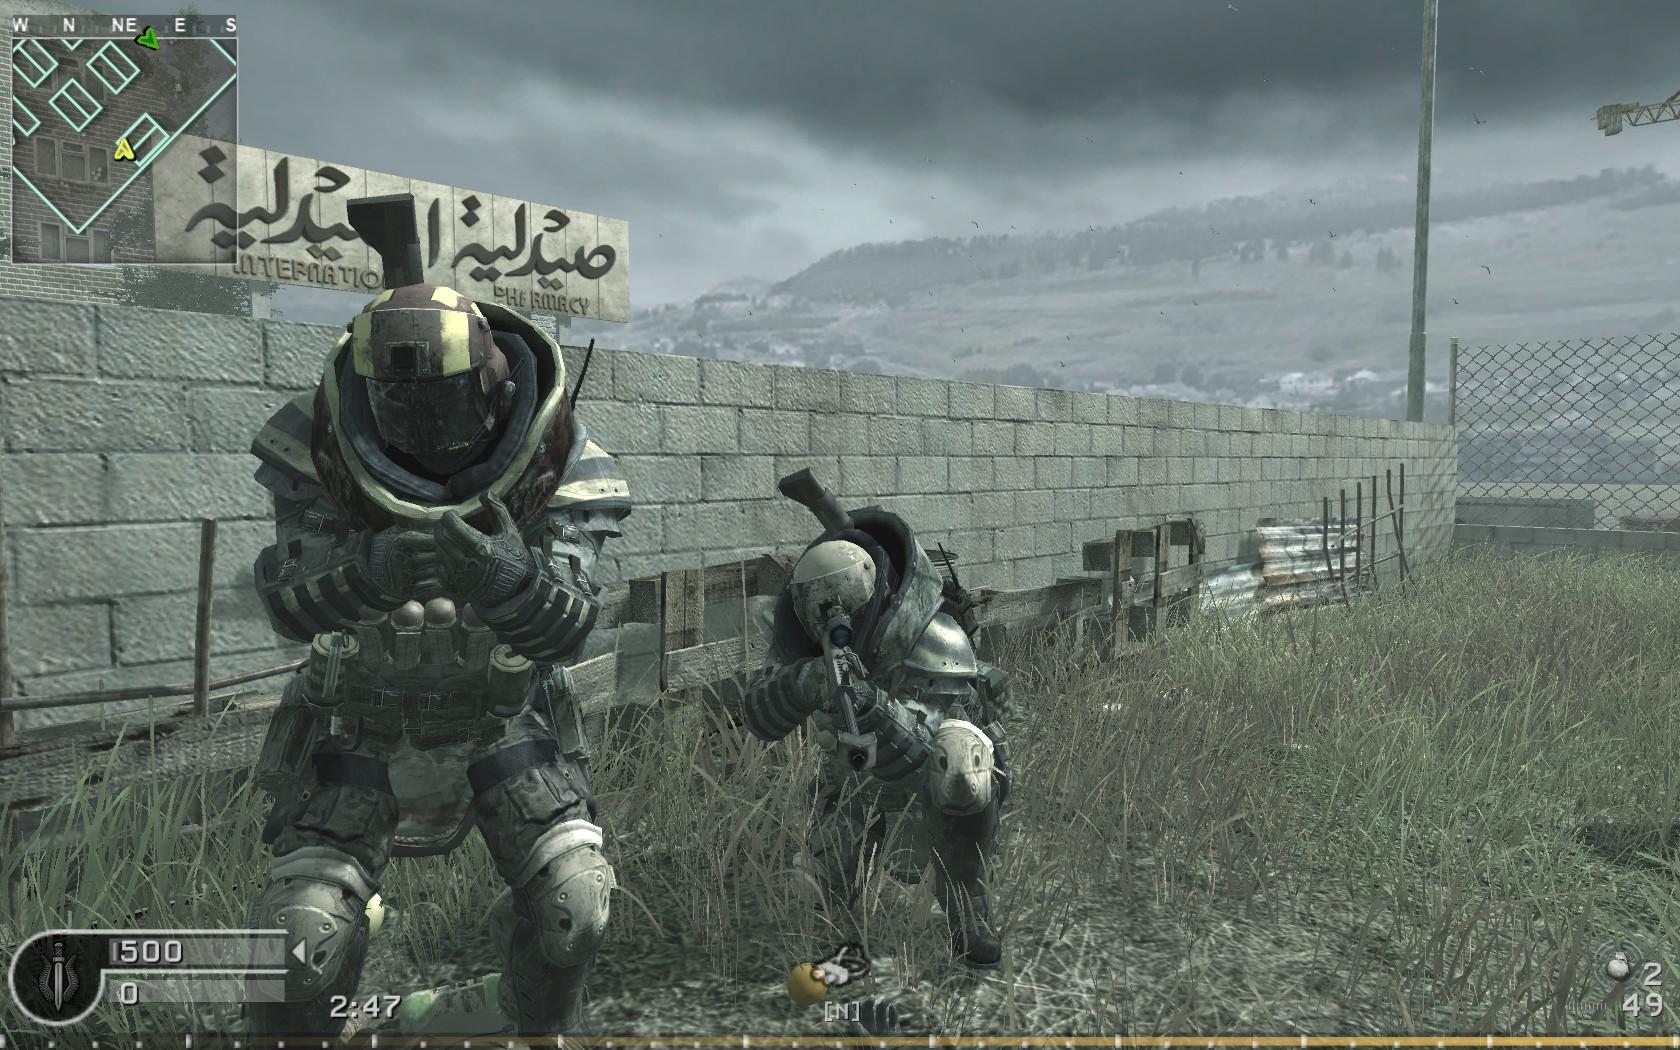 Juggernauts Image Global Ops Mod For Call Of Duty 4 Modern Warfare Mod Db